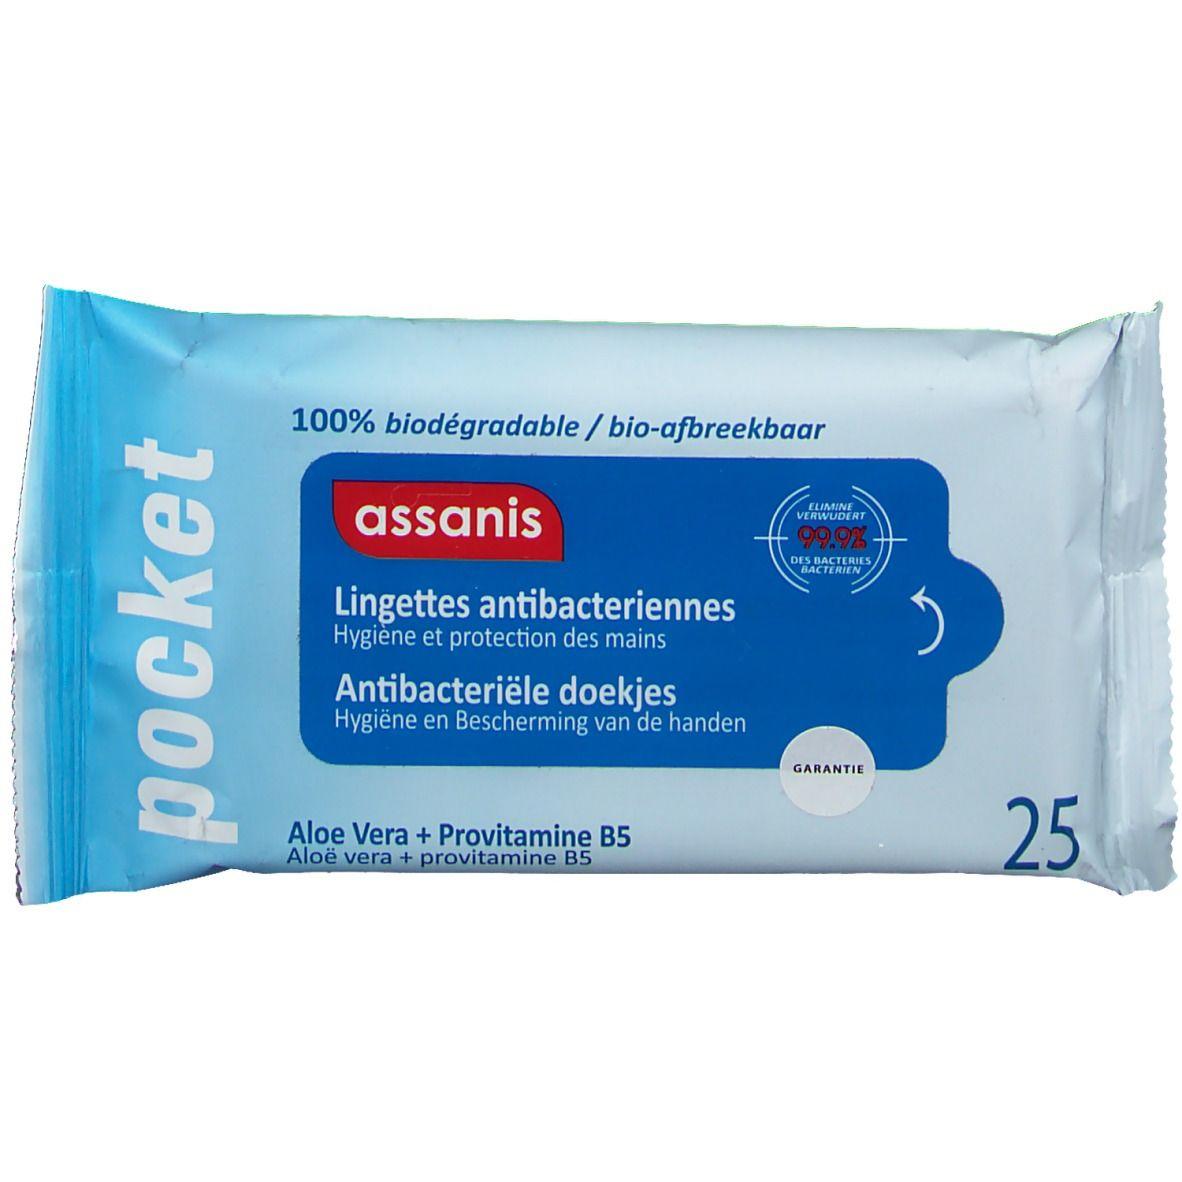 Image of assanis antibakterielle Feuchttücher Reisegröße